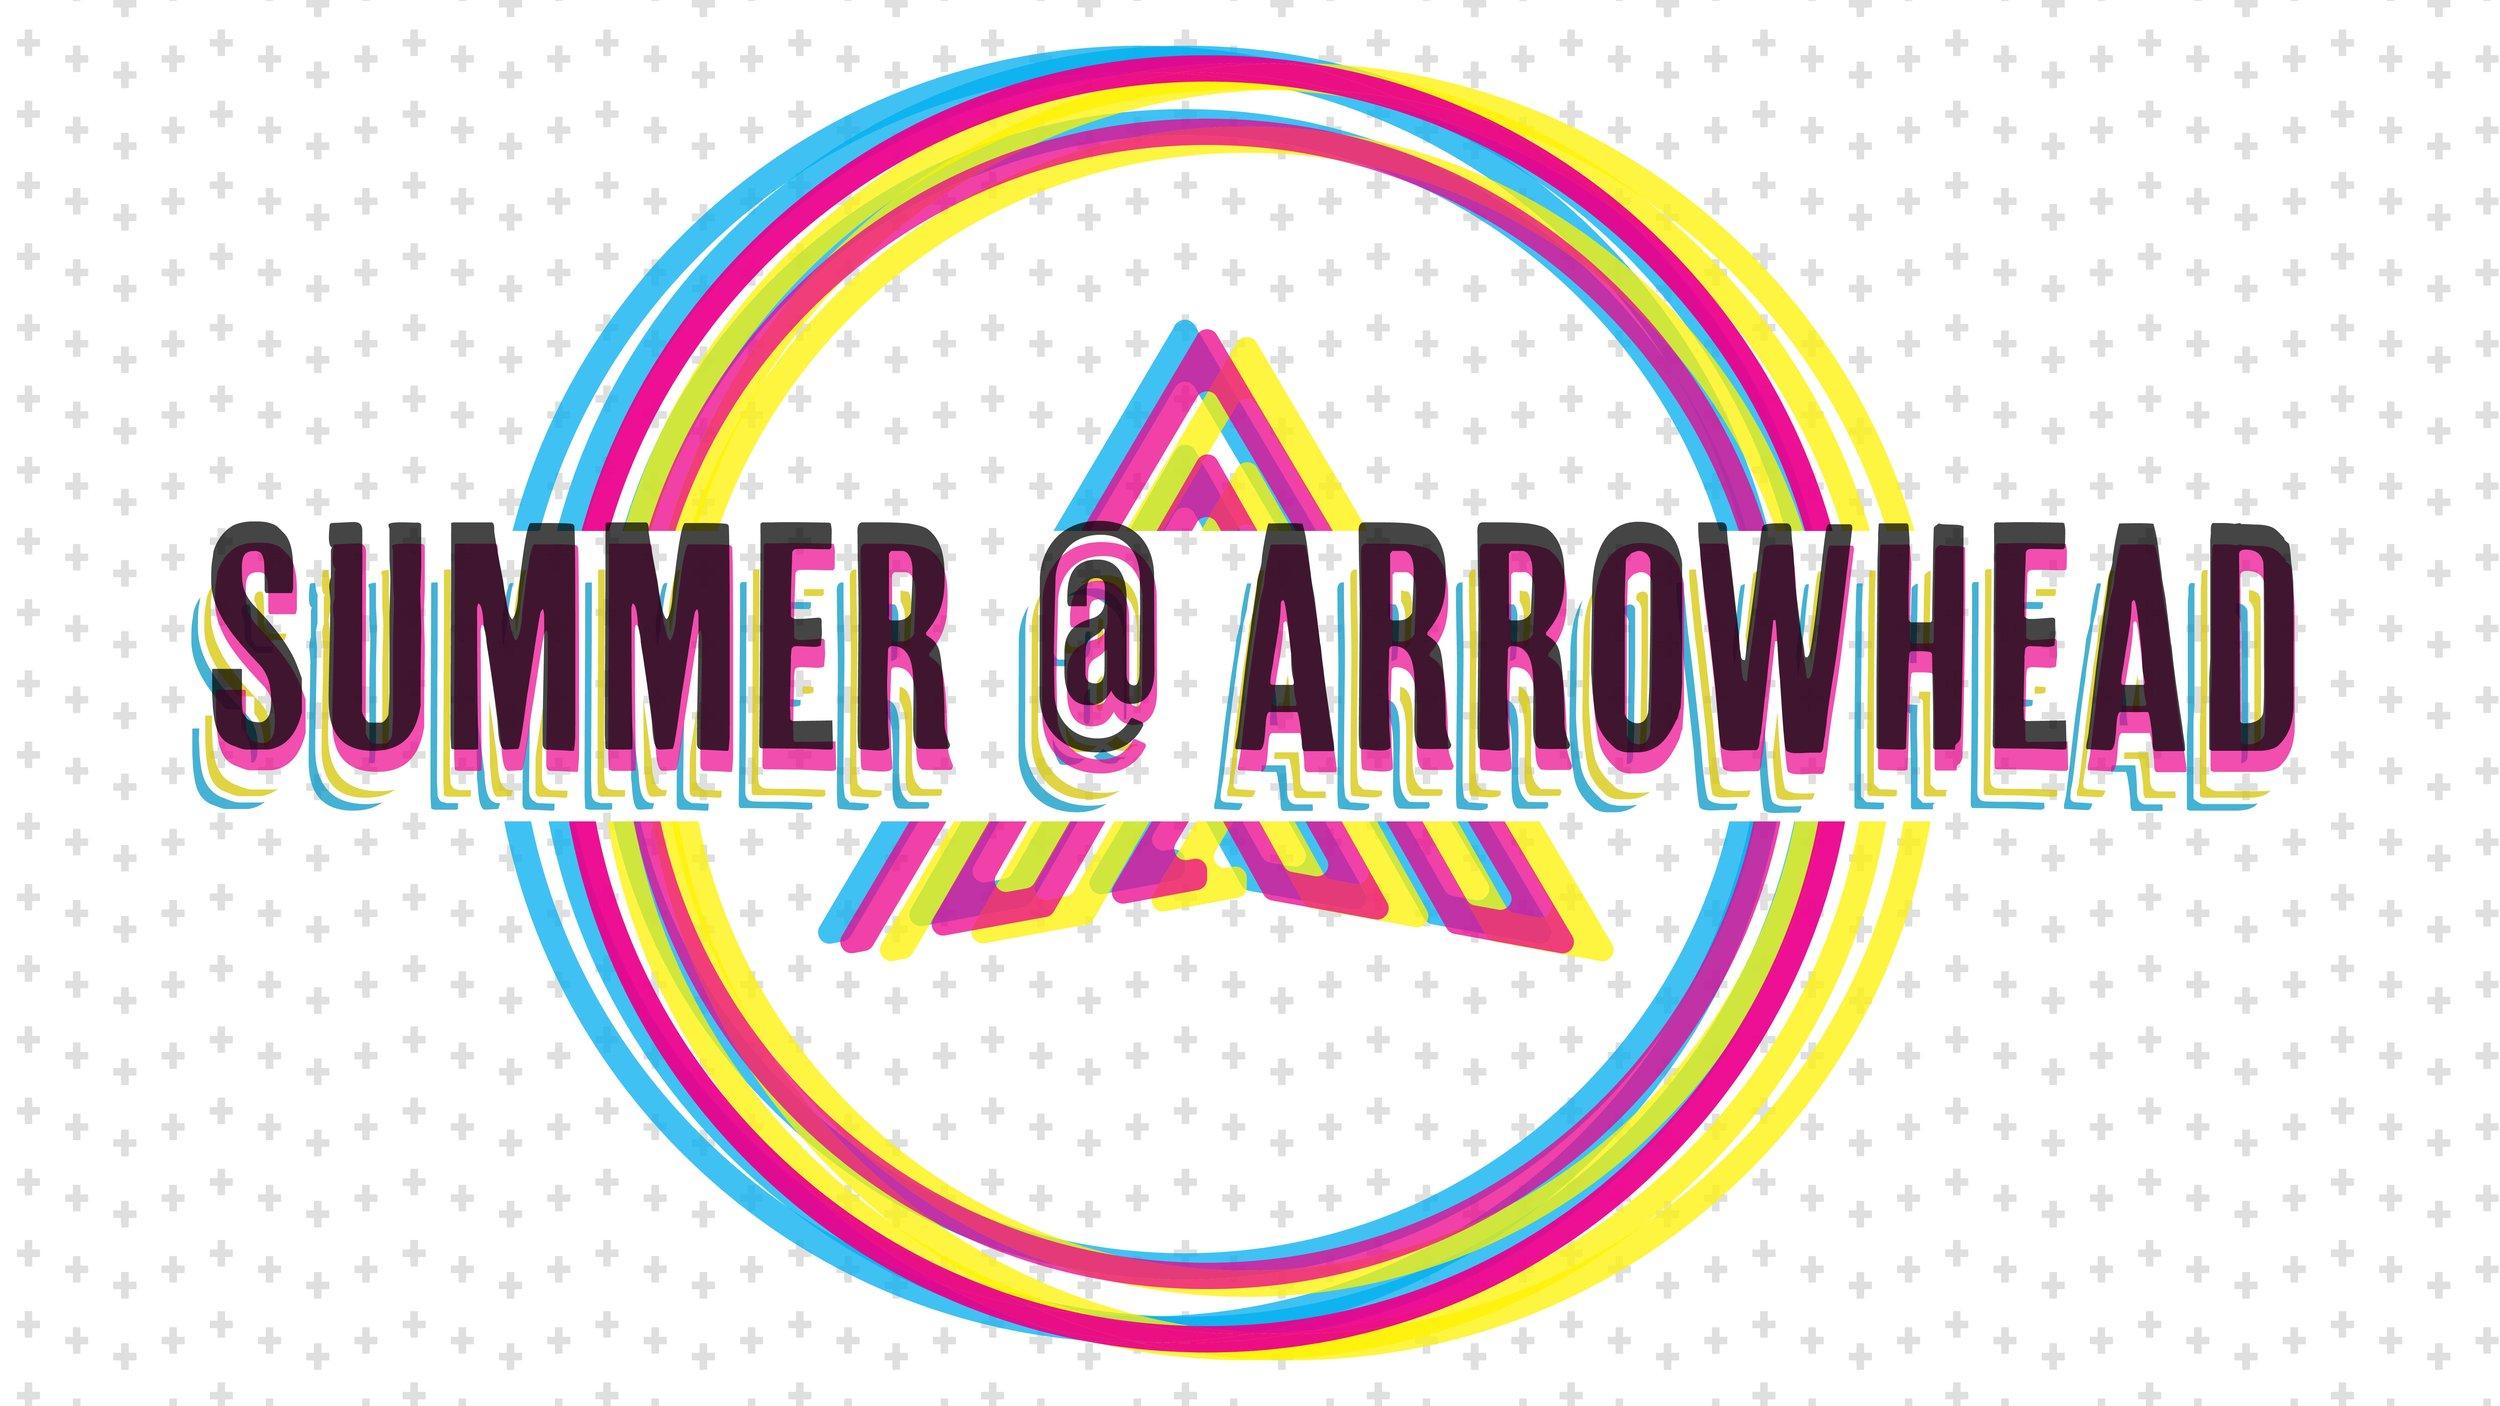 Summer@Ahead_opt 3-03.jpg